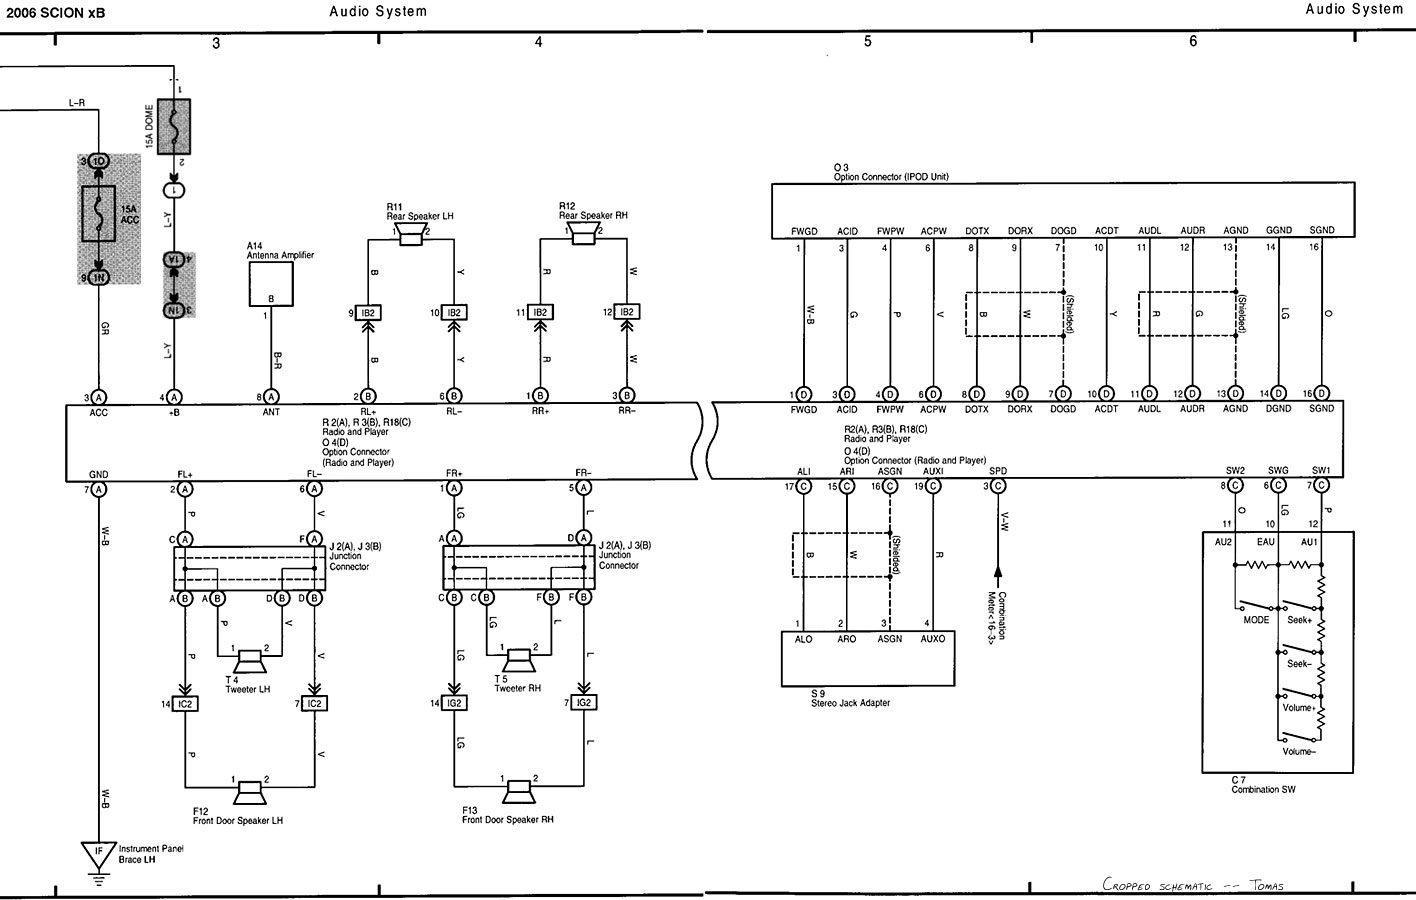 2005 scion tc radio wiring diagram?td1508751668 scion amplifier wiring diagram scion wiring diagrams collection  at eliteediting.co